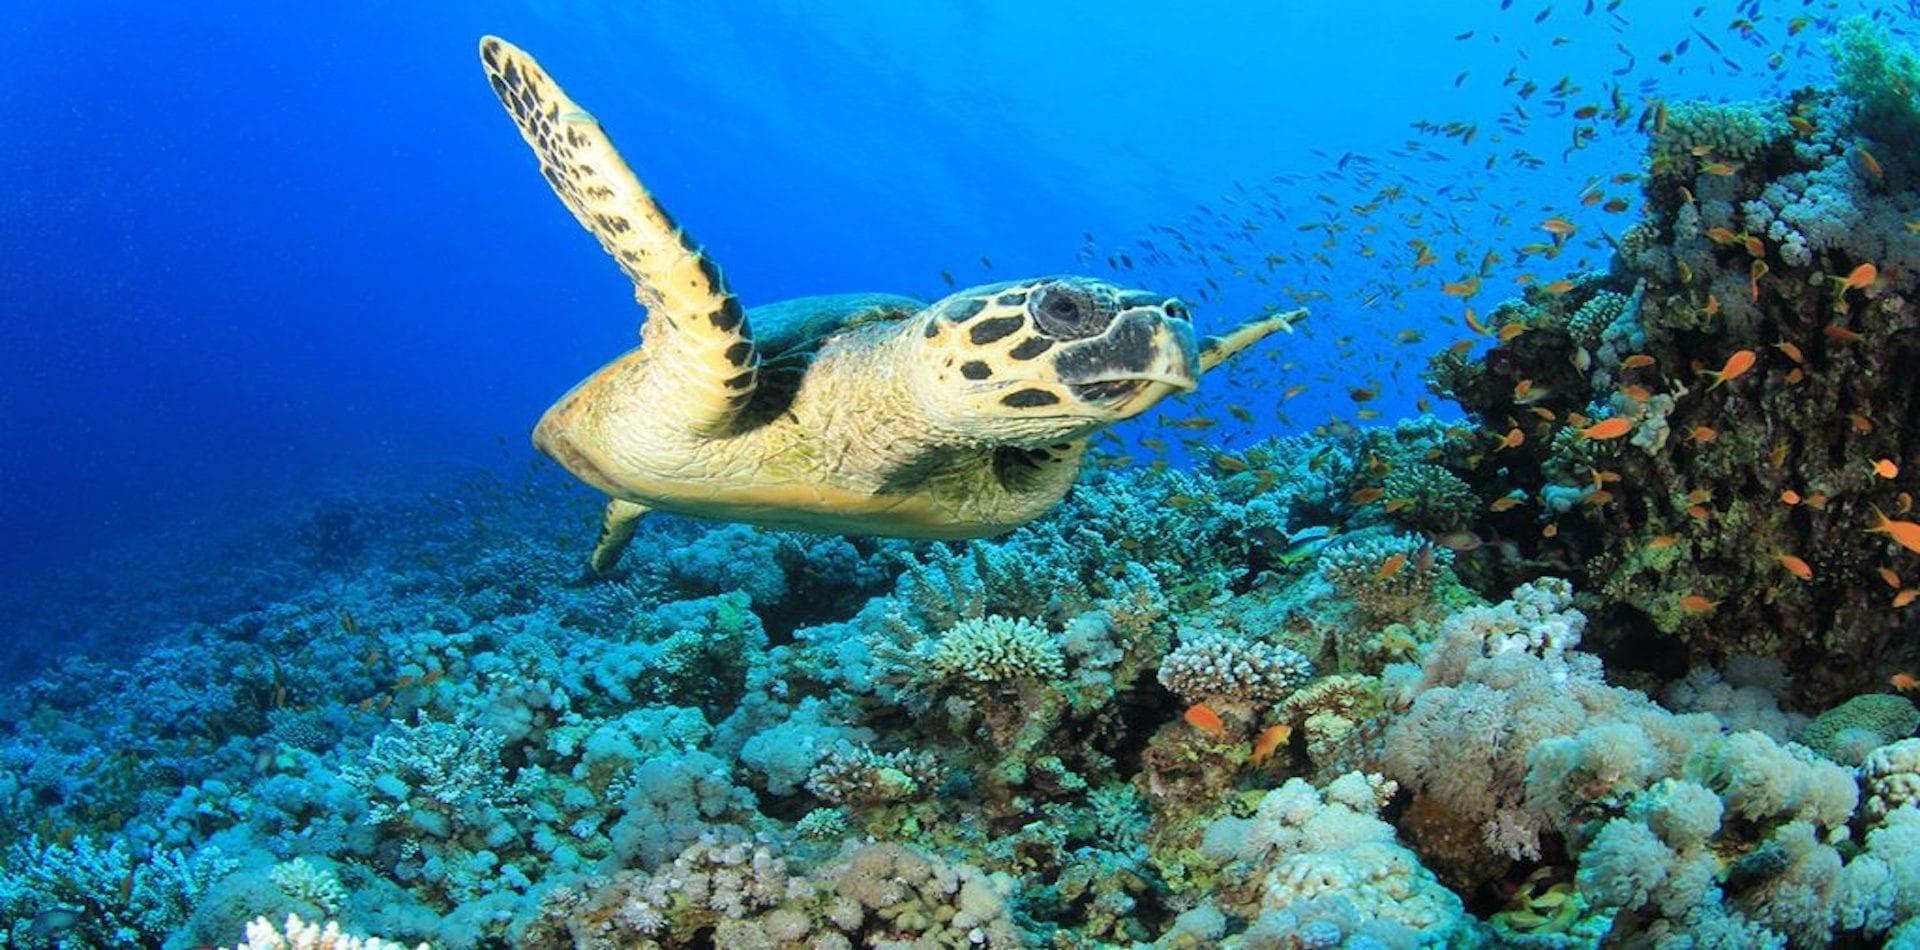 turtle enjoying the plastic free corals